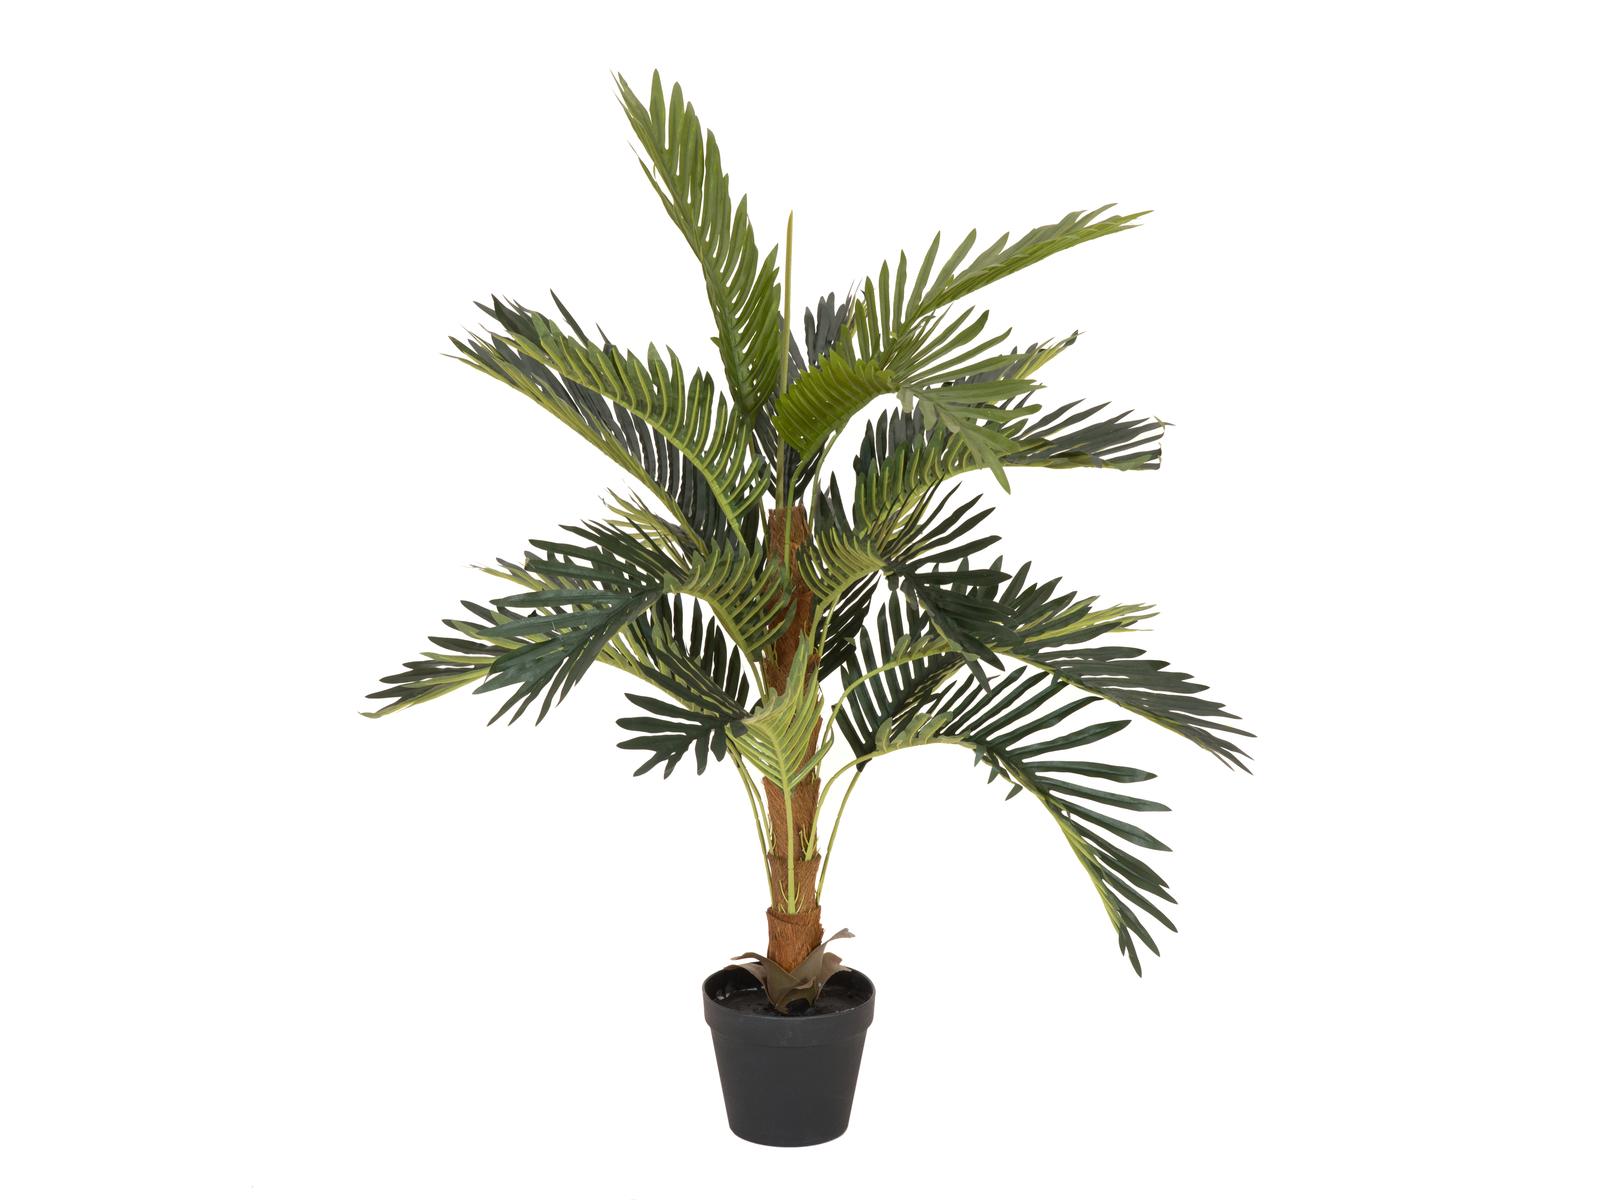 EUROPALMS plant, artificial Coconut palm tree, 90cm